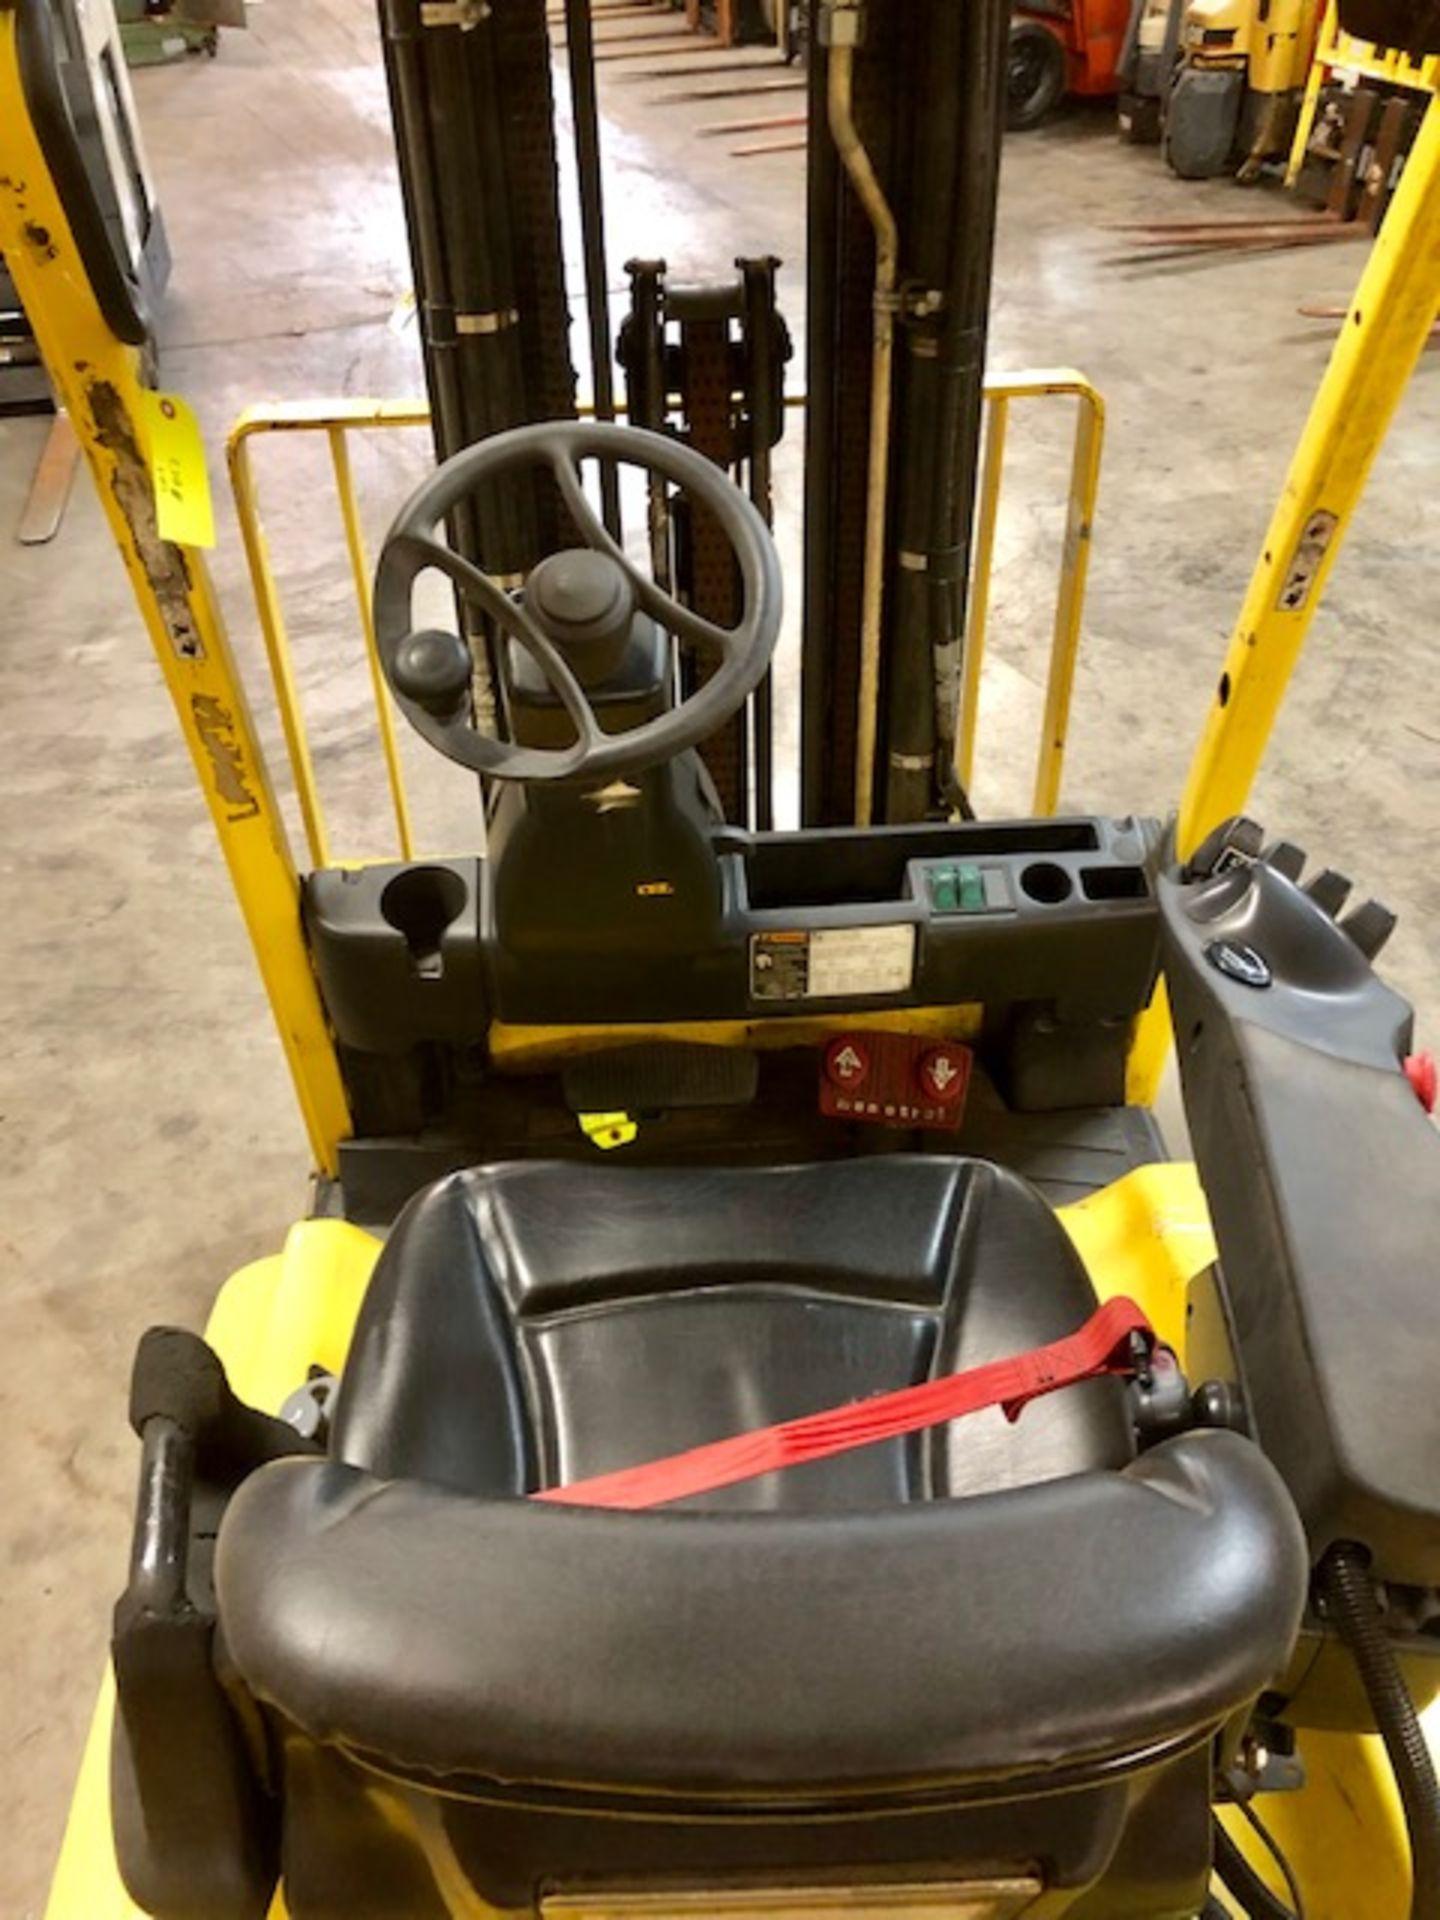 Lot 12 - Hyster forklift J40XN w/48V battery